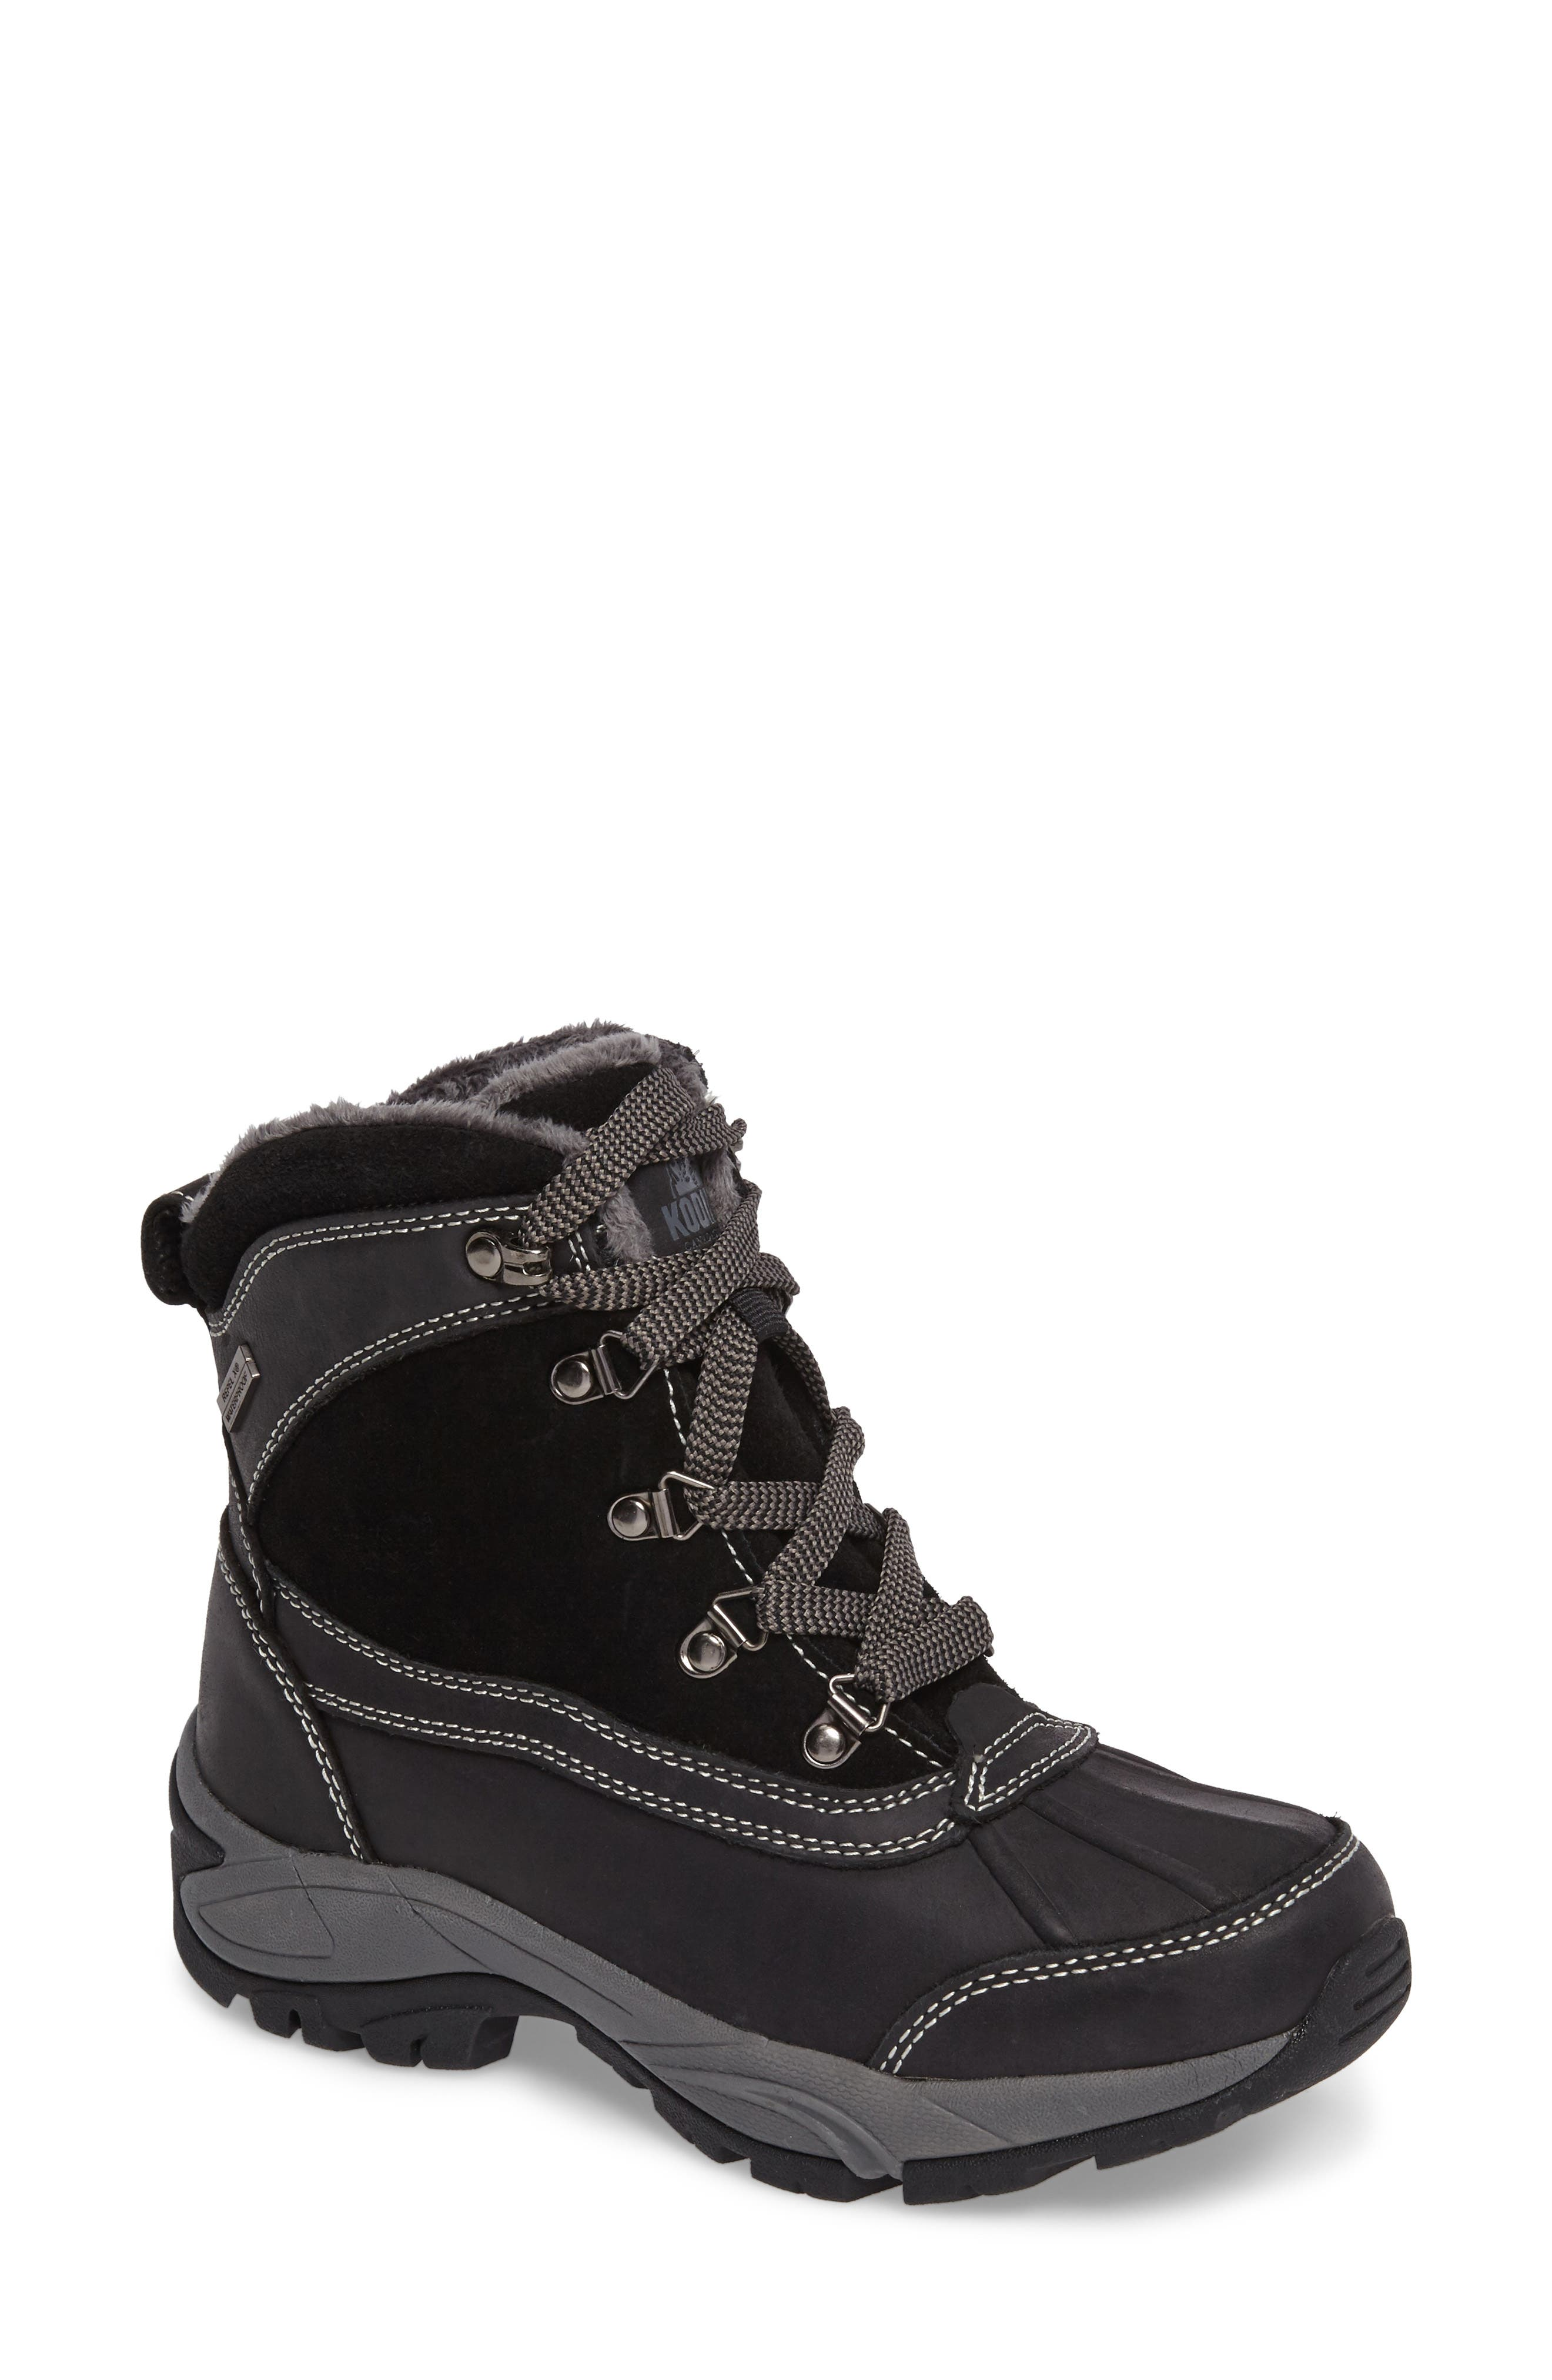 Kodiak 'Renee' Waterproof Insulated Winter Boot (Women)